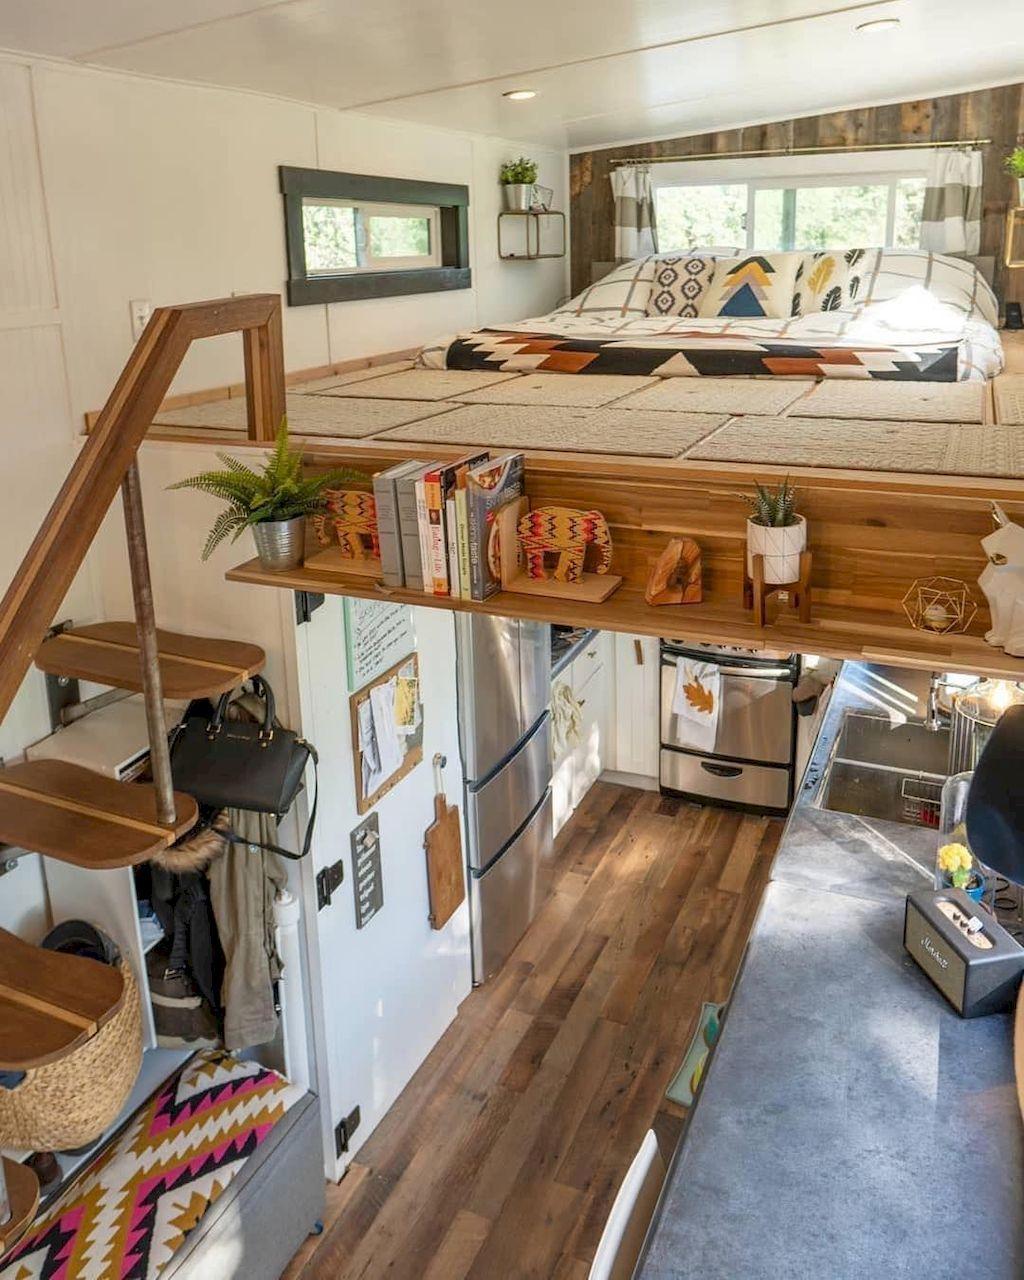 70 Clever Tiny House Interior Design Ideas #tinyhousestorage